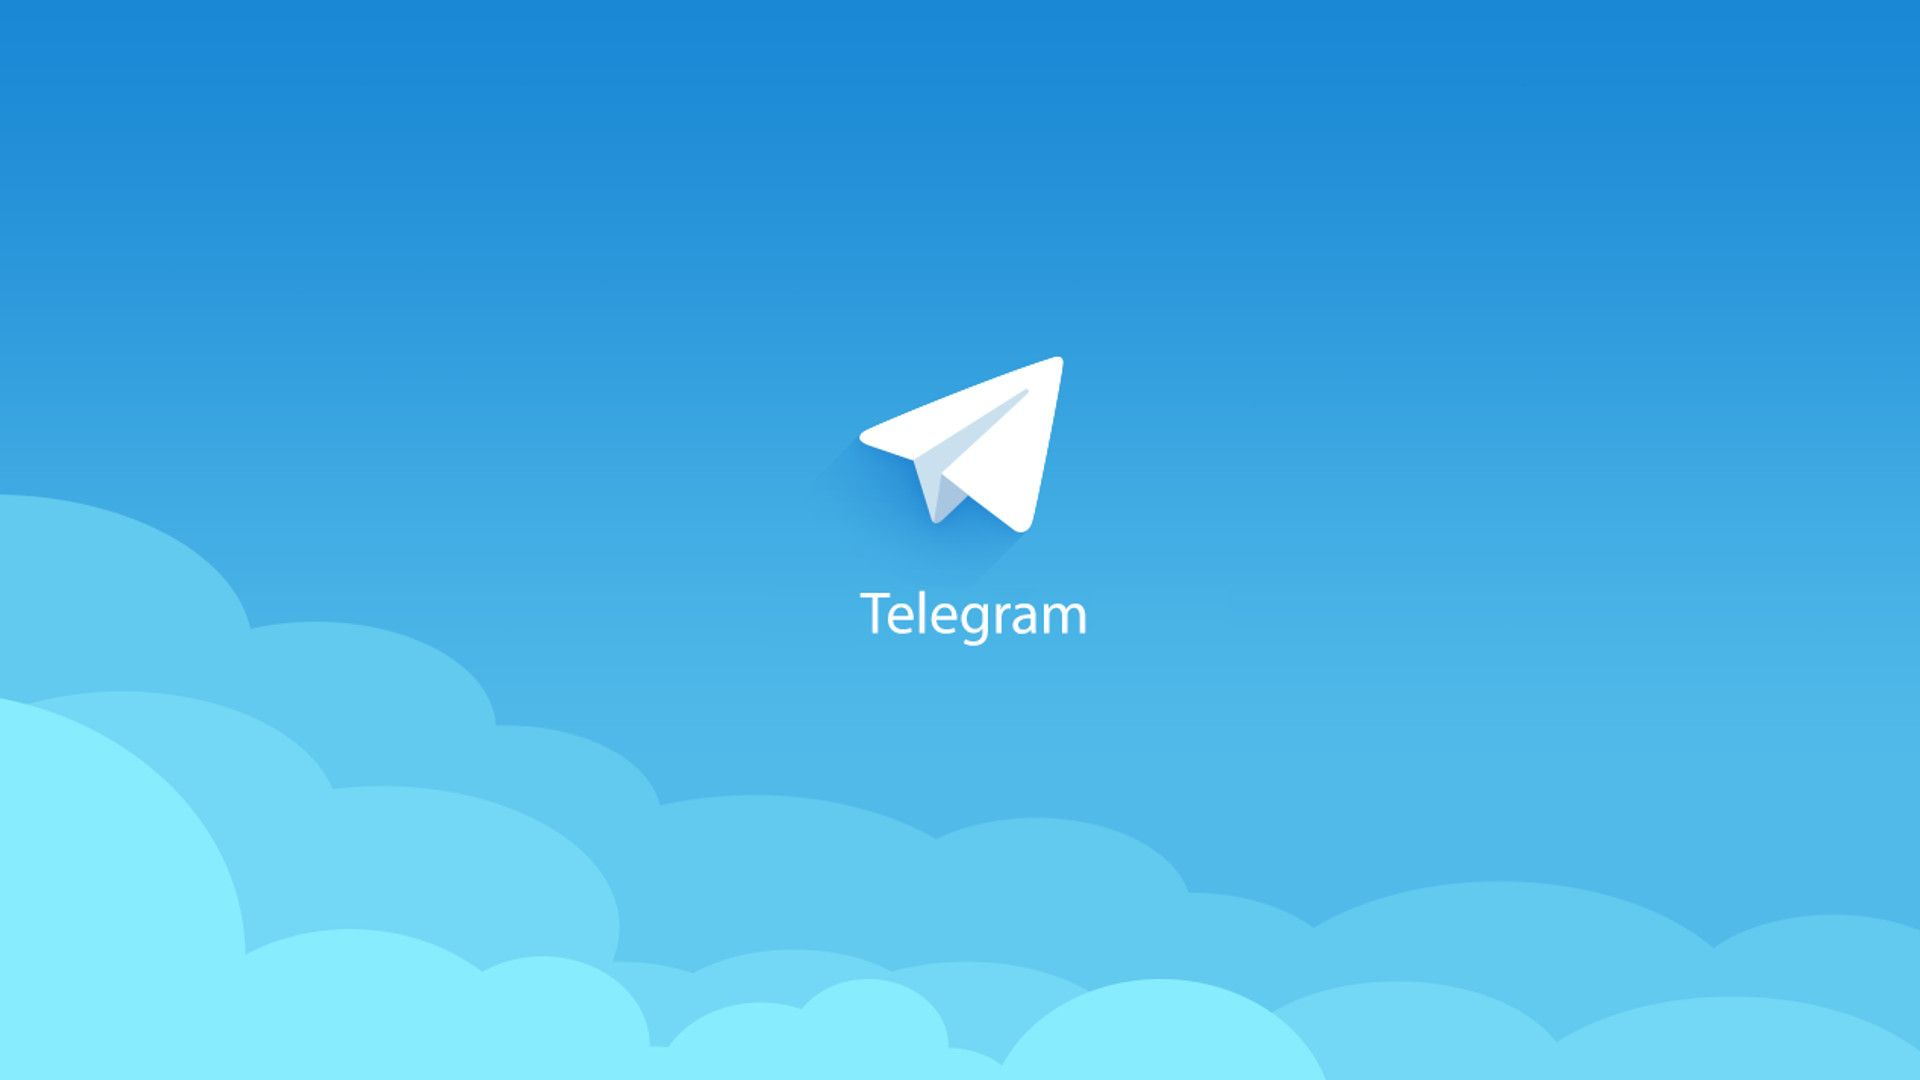 حذف اکانت تلگرام | دیلیت اکانت تلگرام